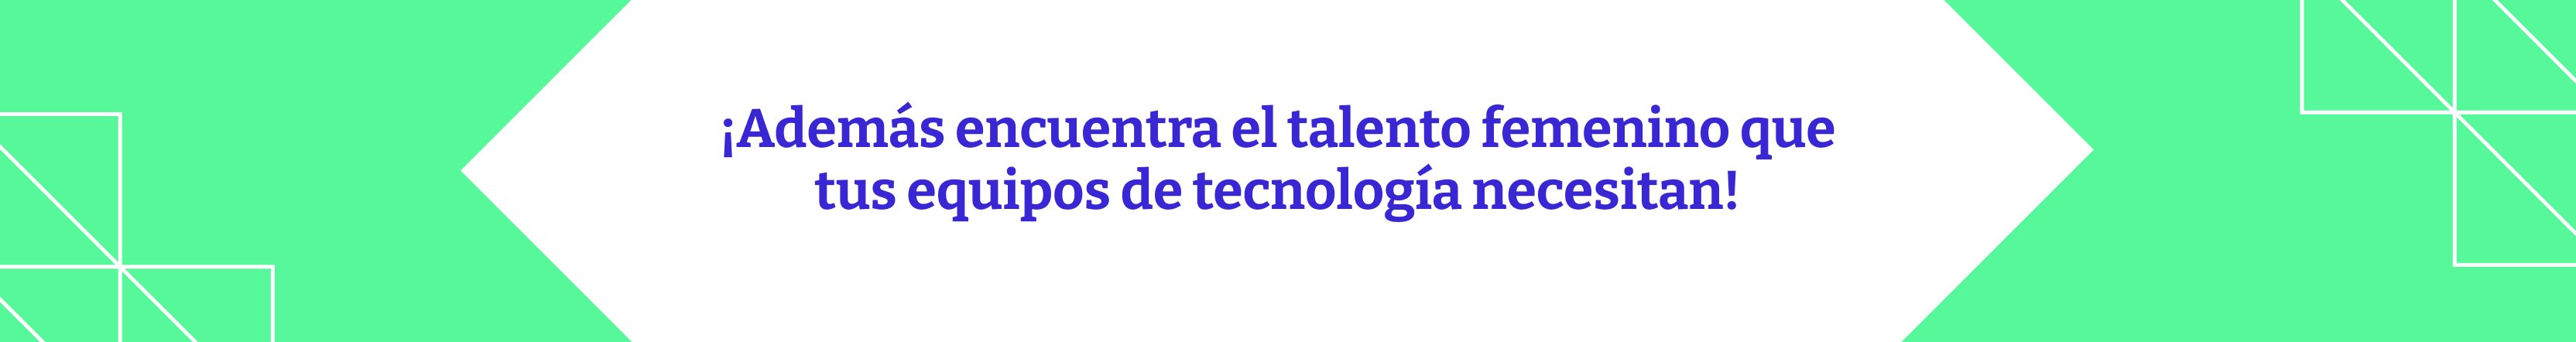 Contrata talento tech